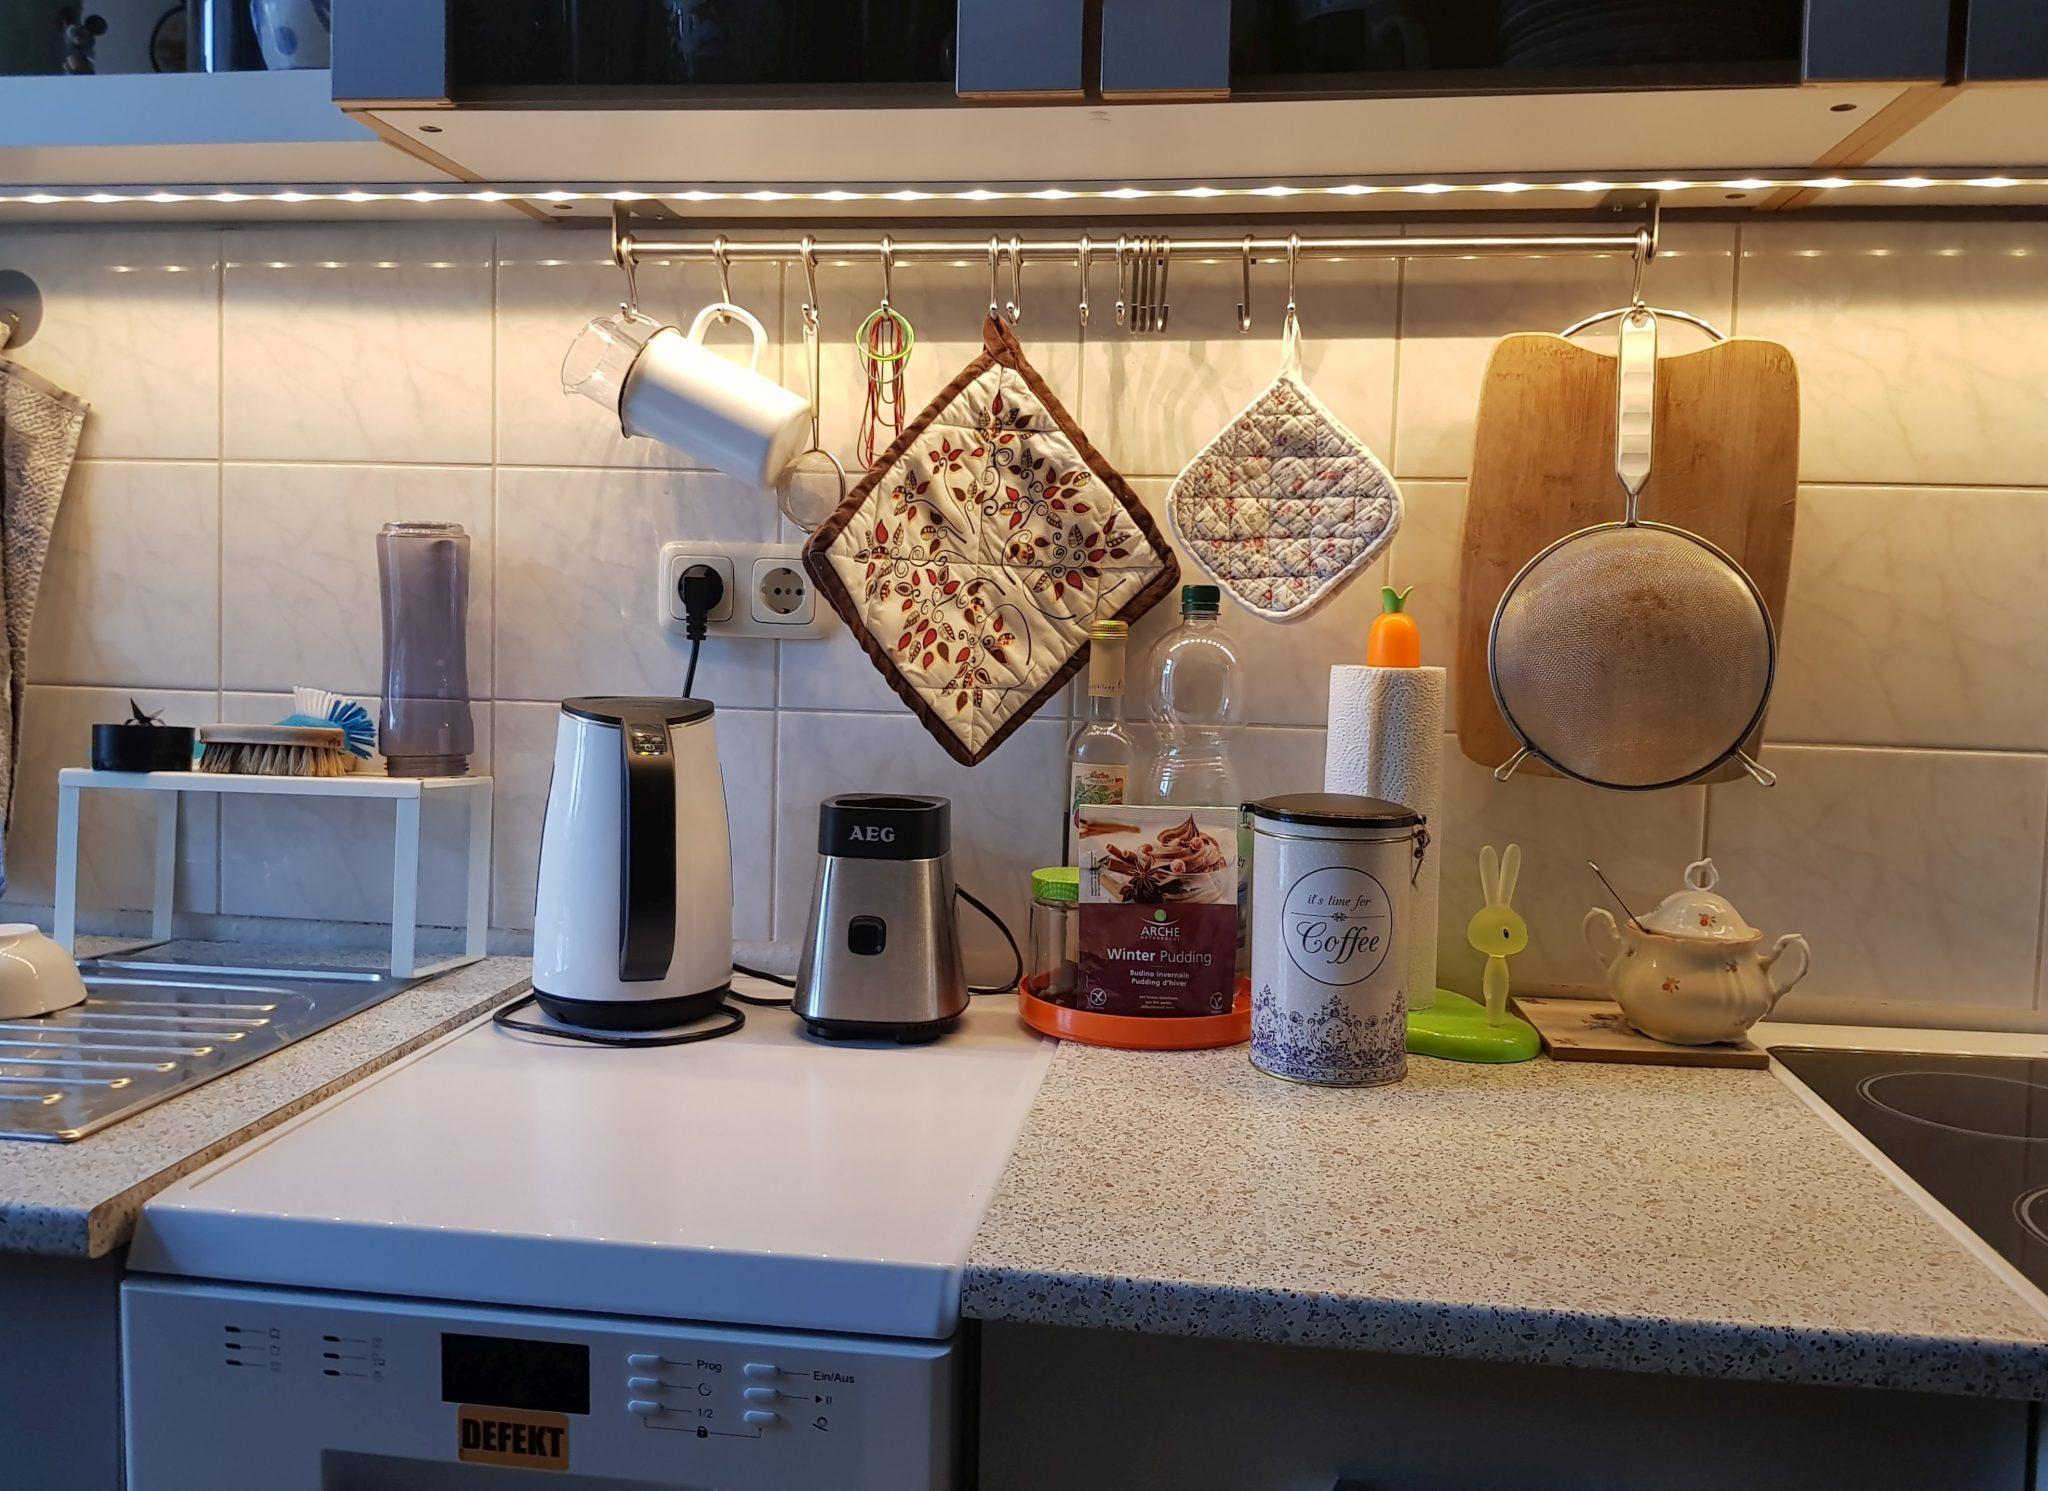 wasseranschluss k che anleitung h ngekorb k che wandbilder glas landhausstil abverkauf ikea. Black Bedroom Furniture Sets. Home Design Ideas